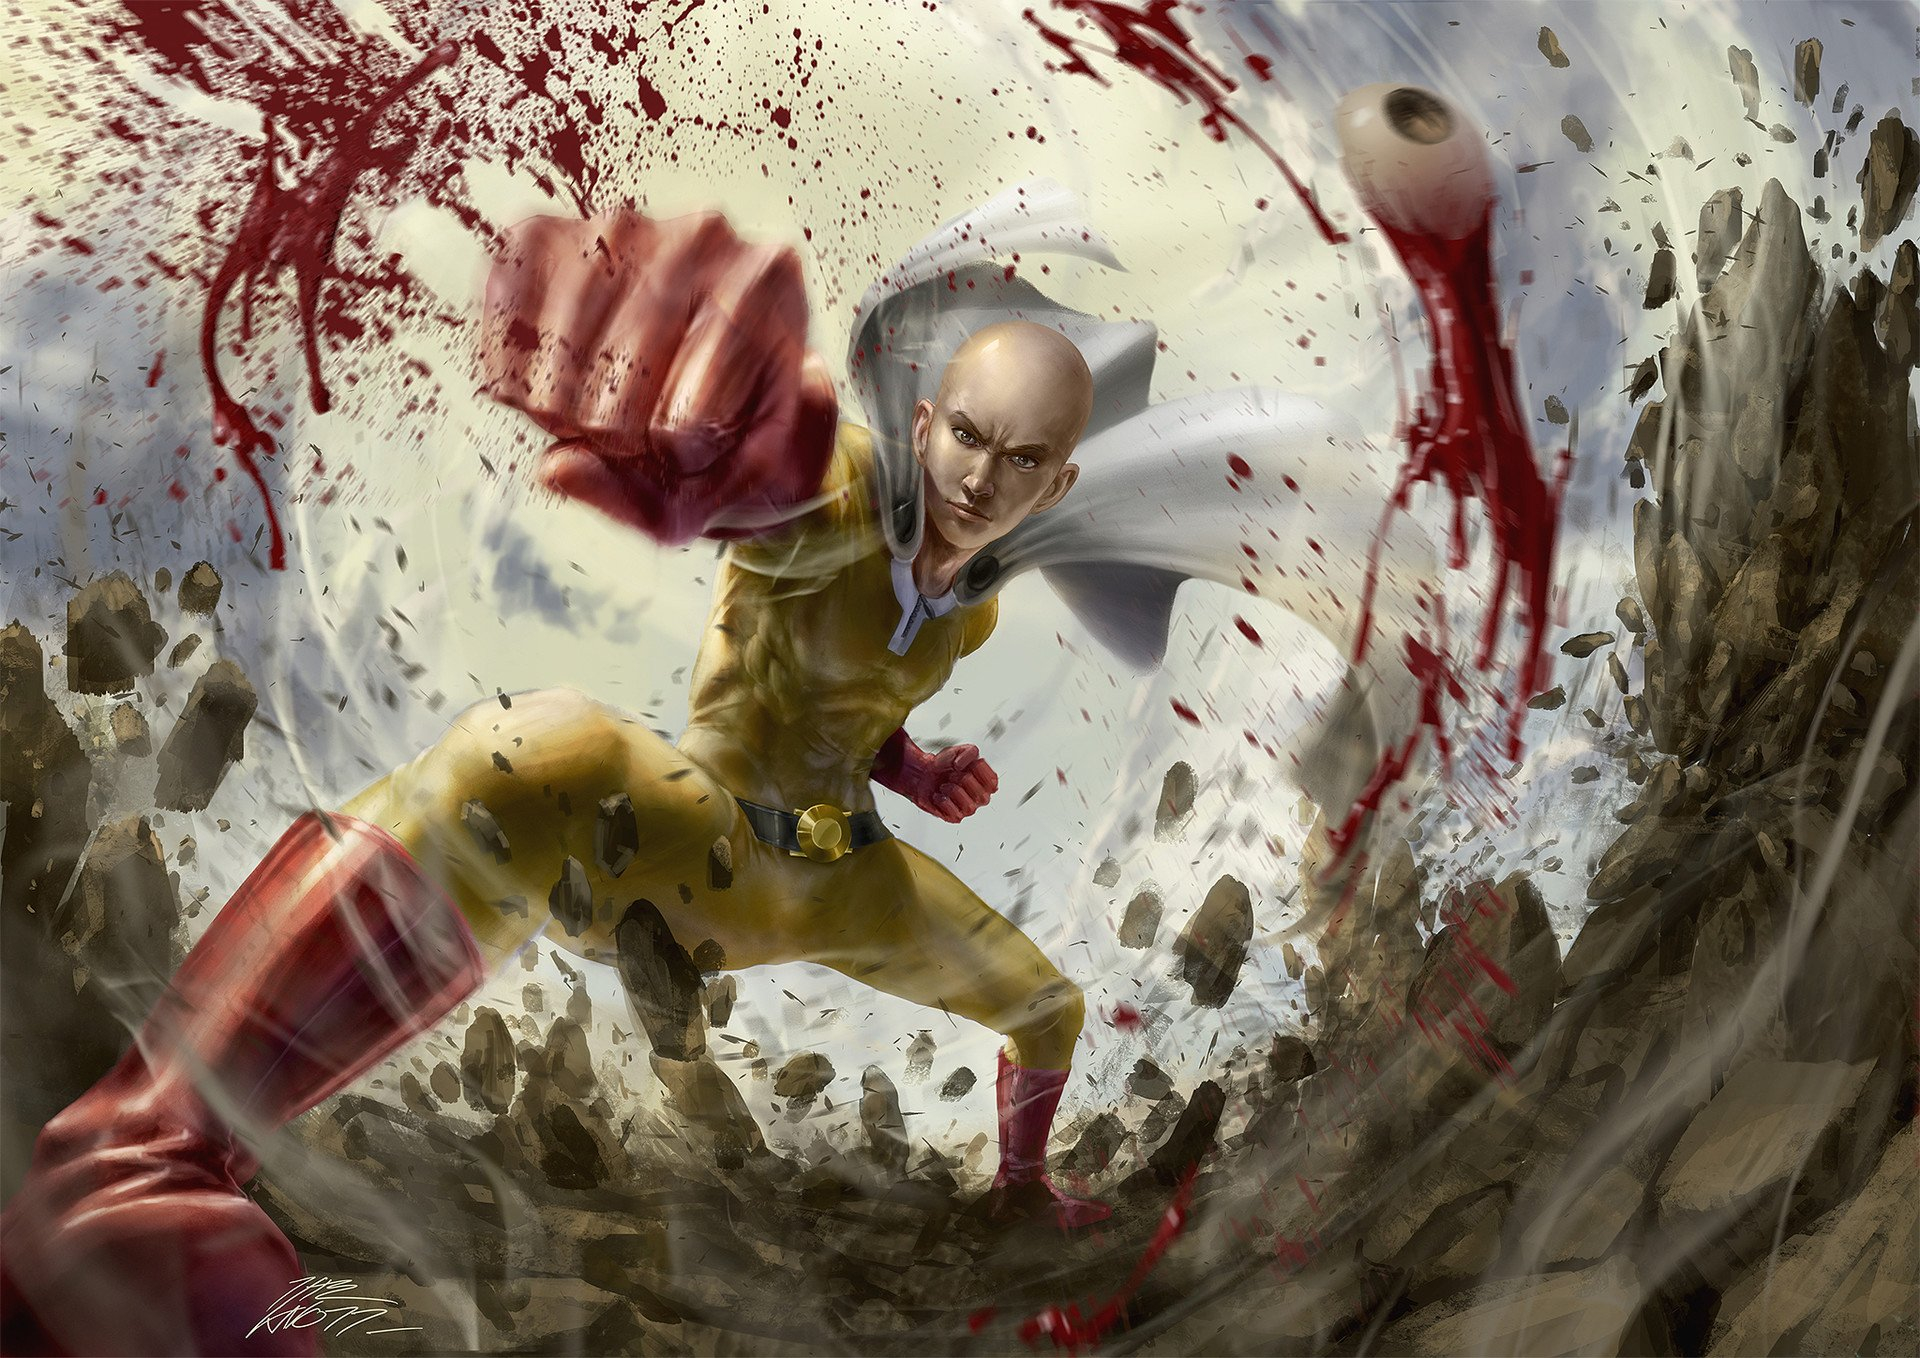 One Punch Saitama Images - Saitama Cool One Punch Man Wallpaper, HD Anime 4K ...